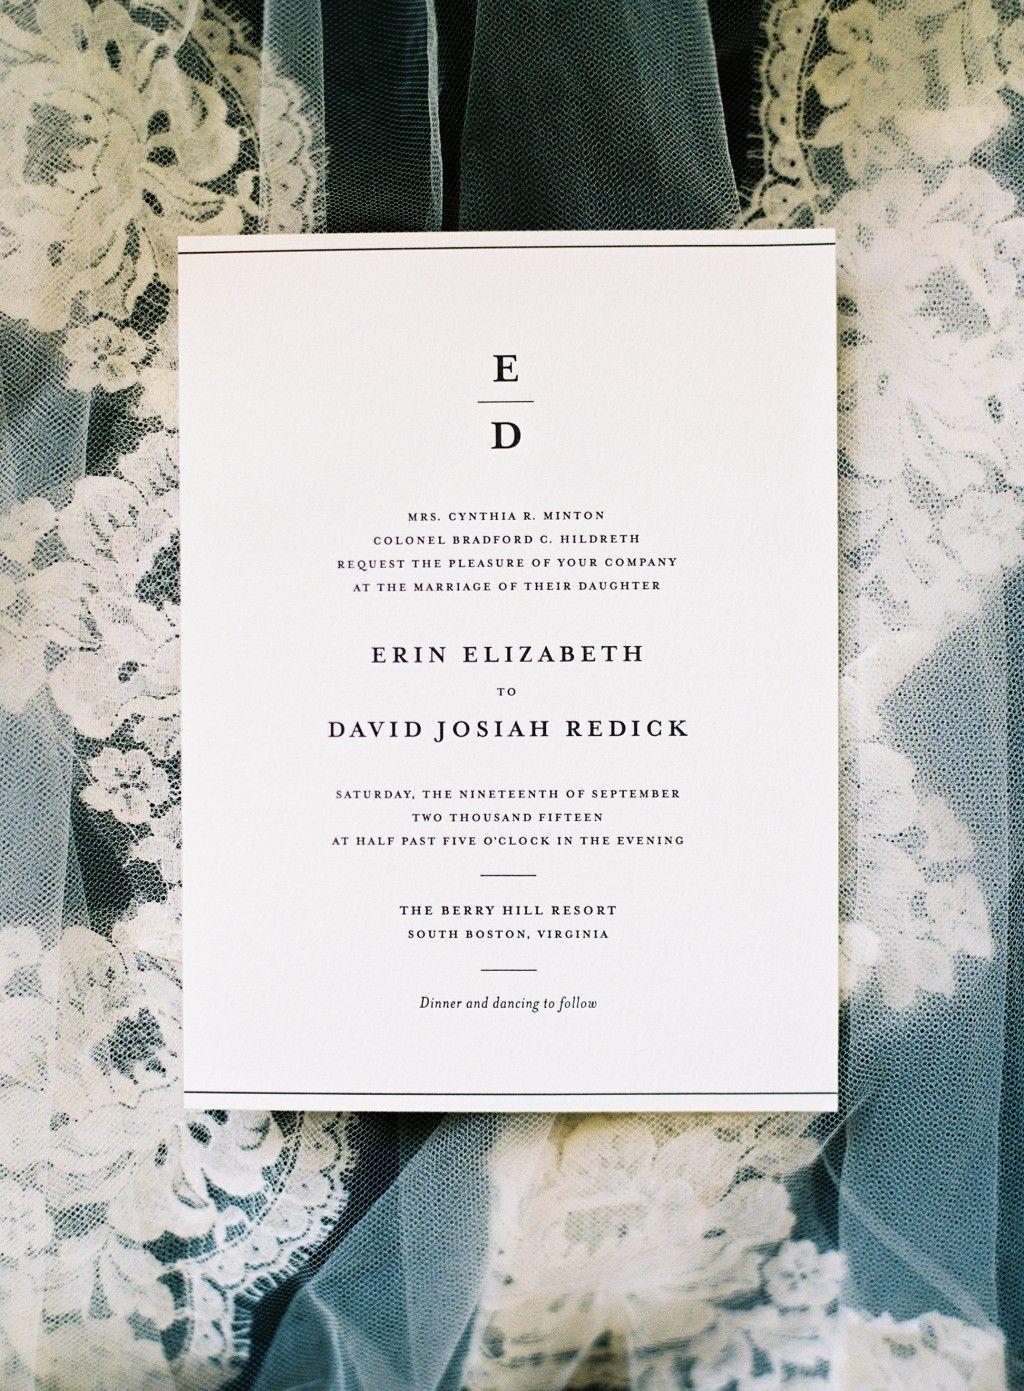 Simple Elegance letterpress wedding invitations from Bella Figura ...